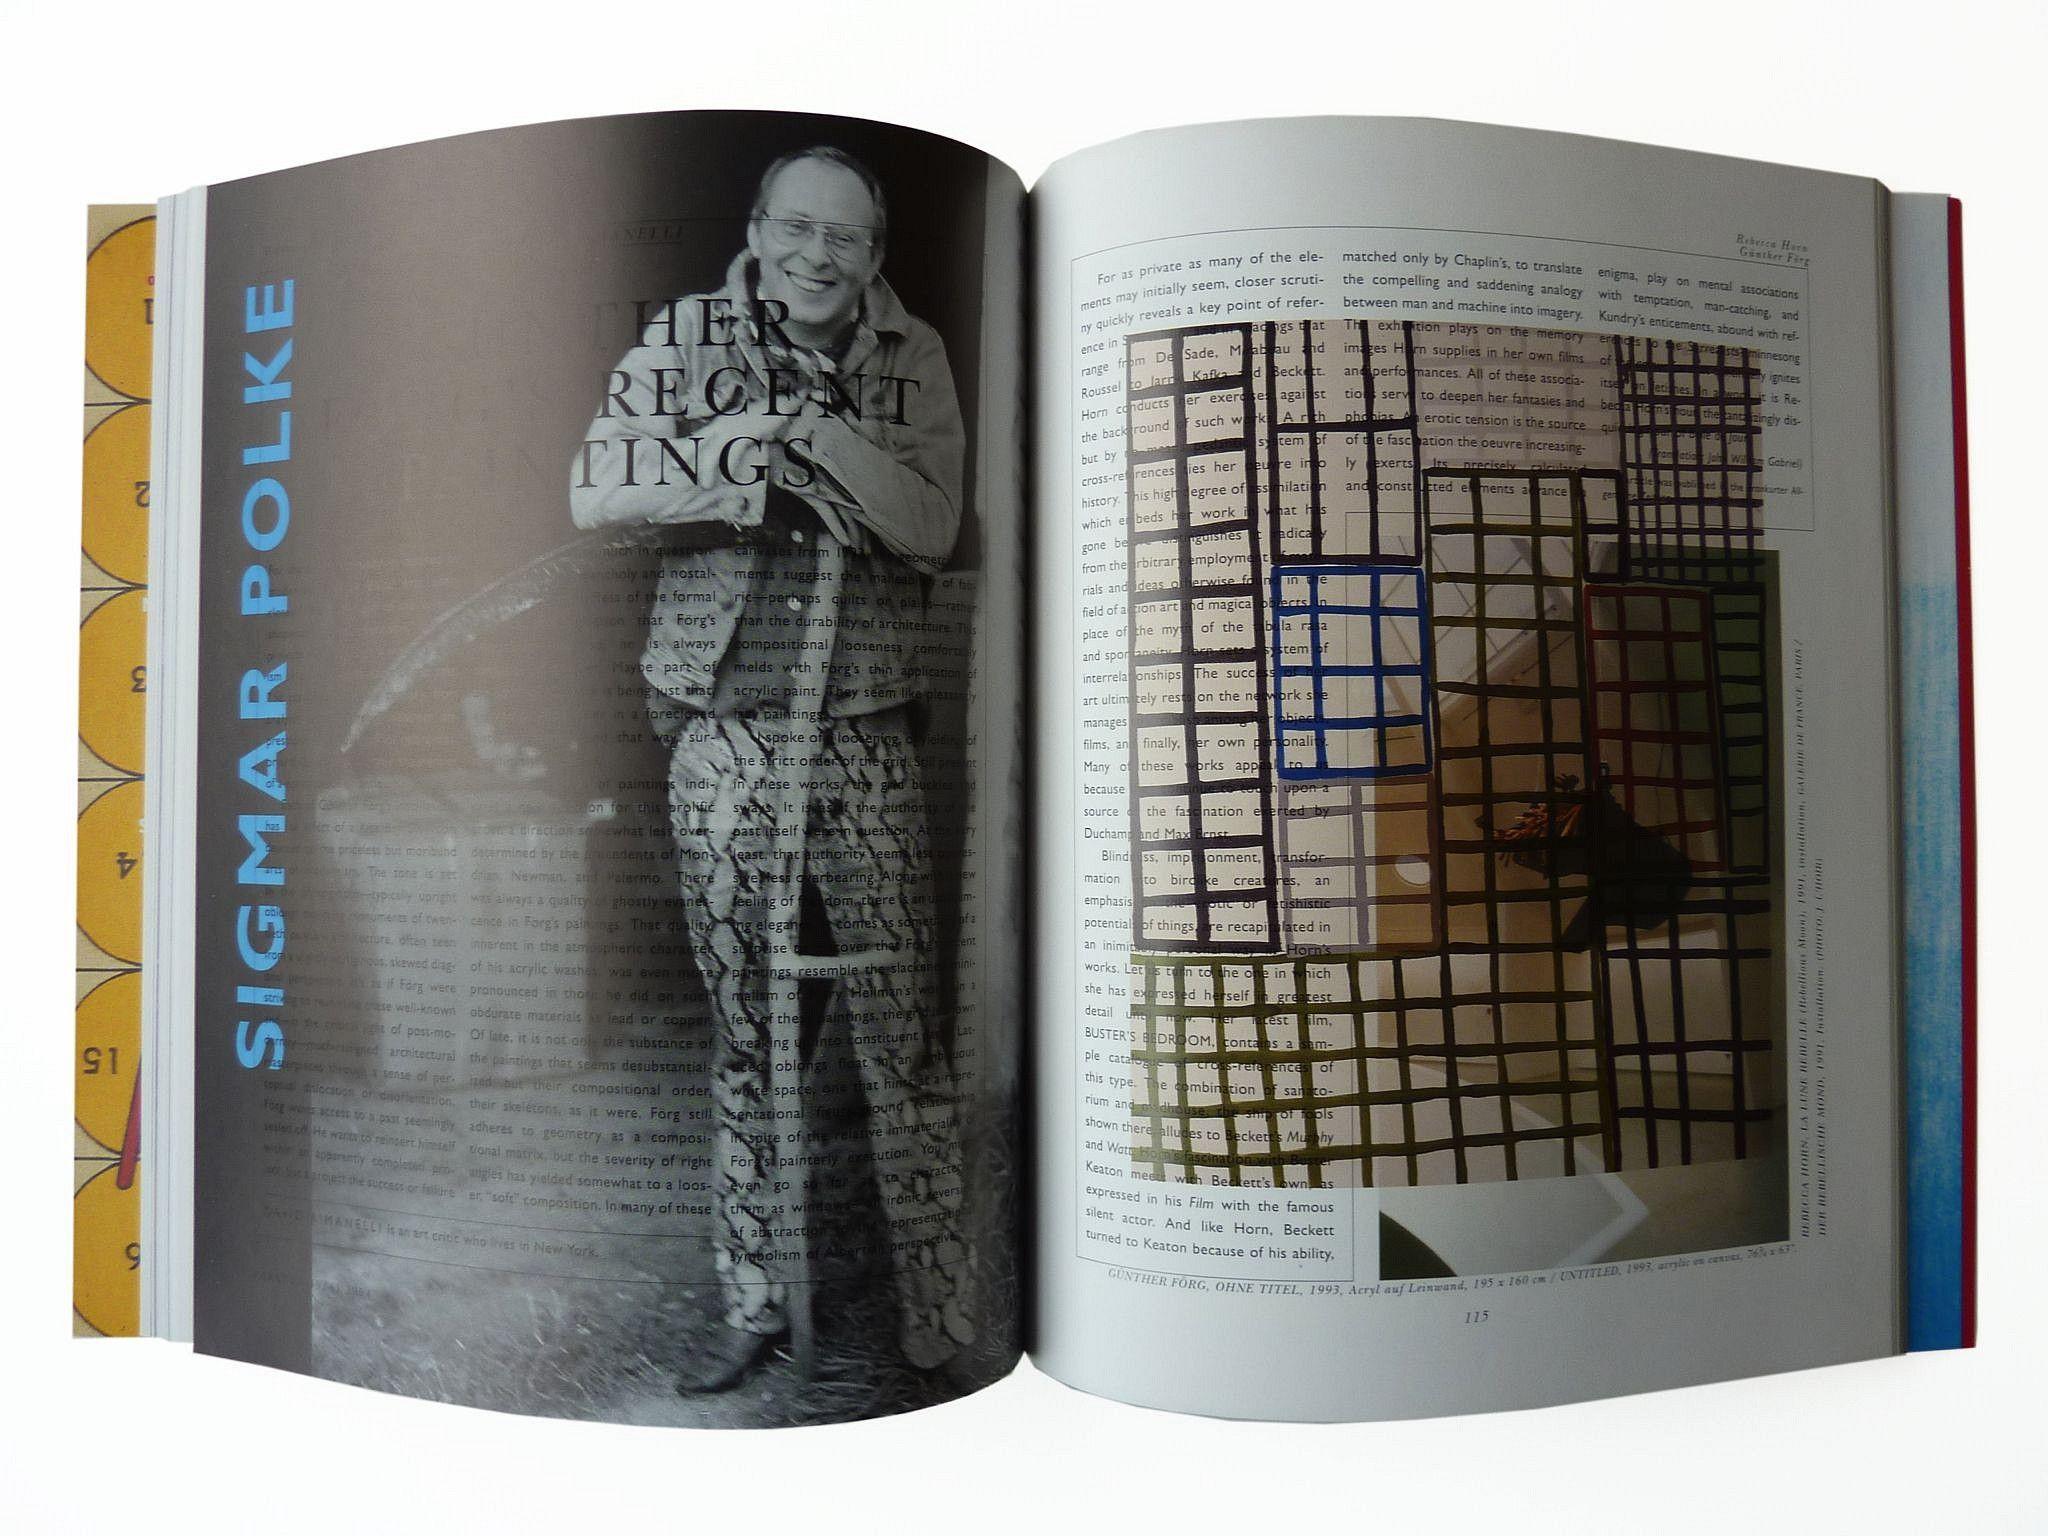 Sigmar Polke, Untitled (Parkett Anniversary I) 1994